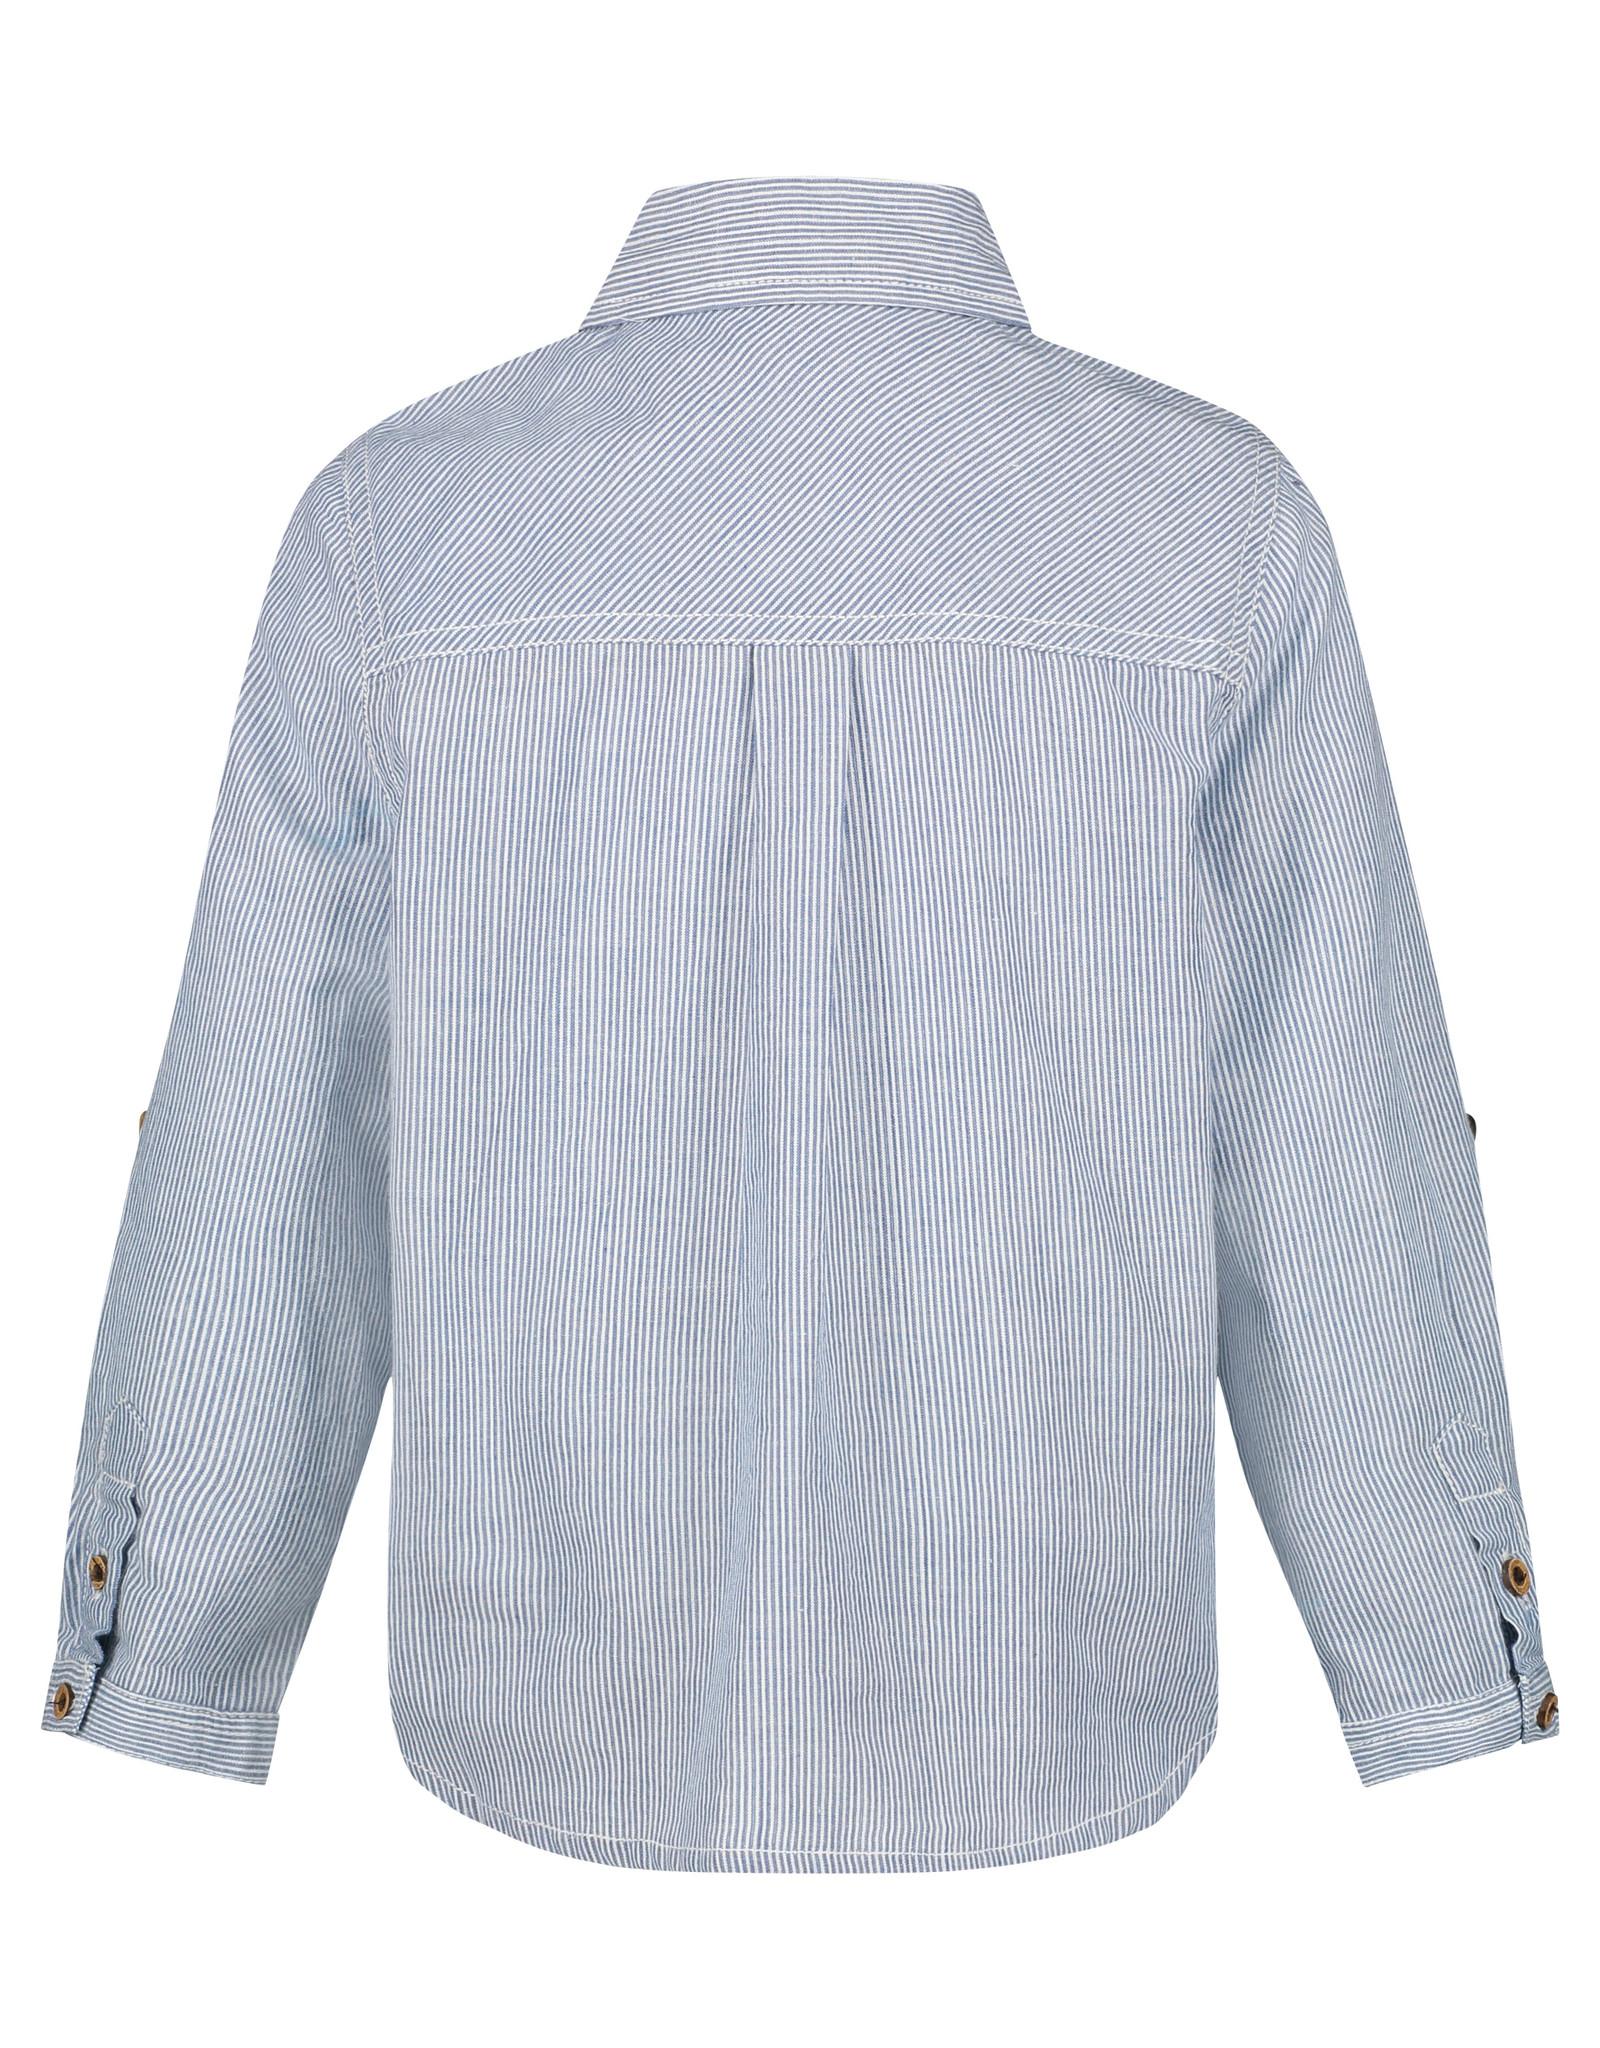 Noppies B Shirt ls Mims Y/D str, Blanc de Blanc